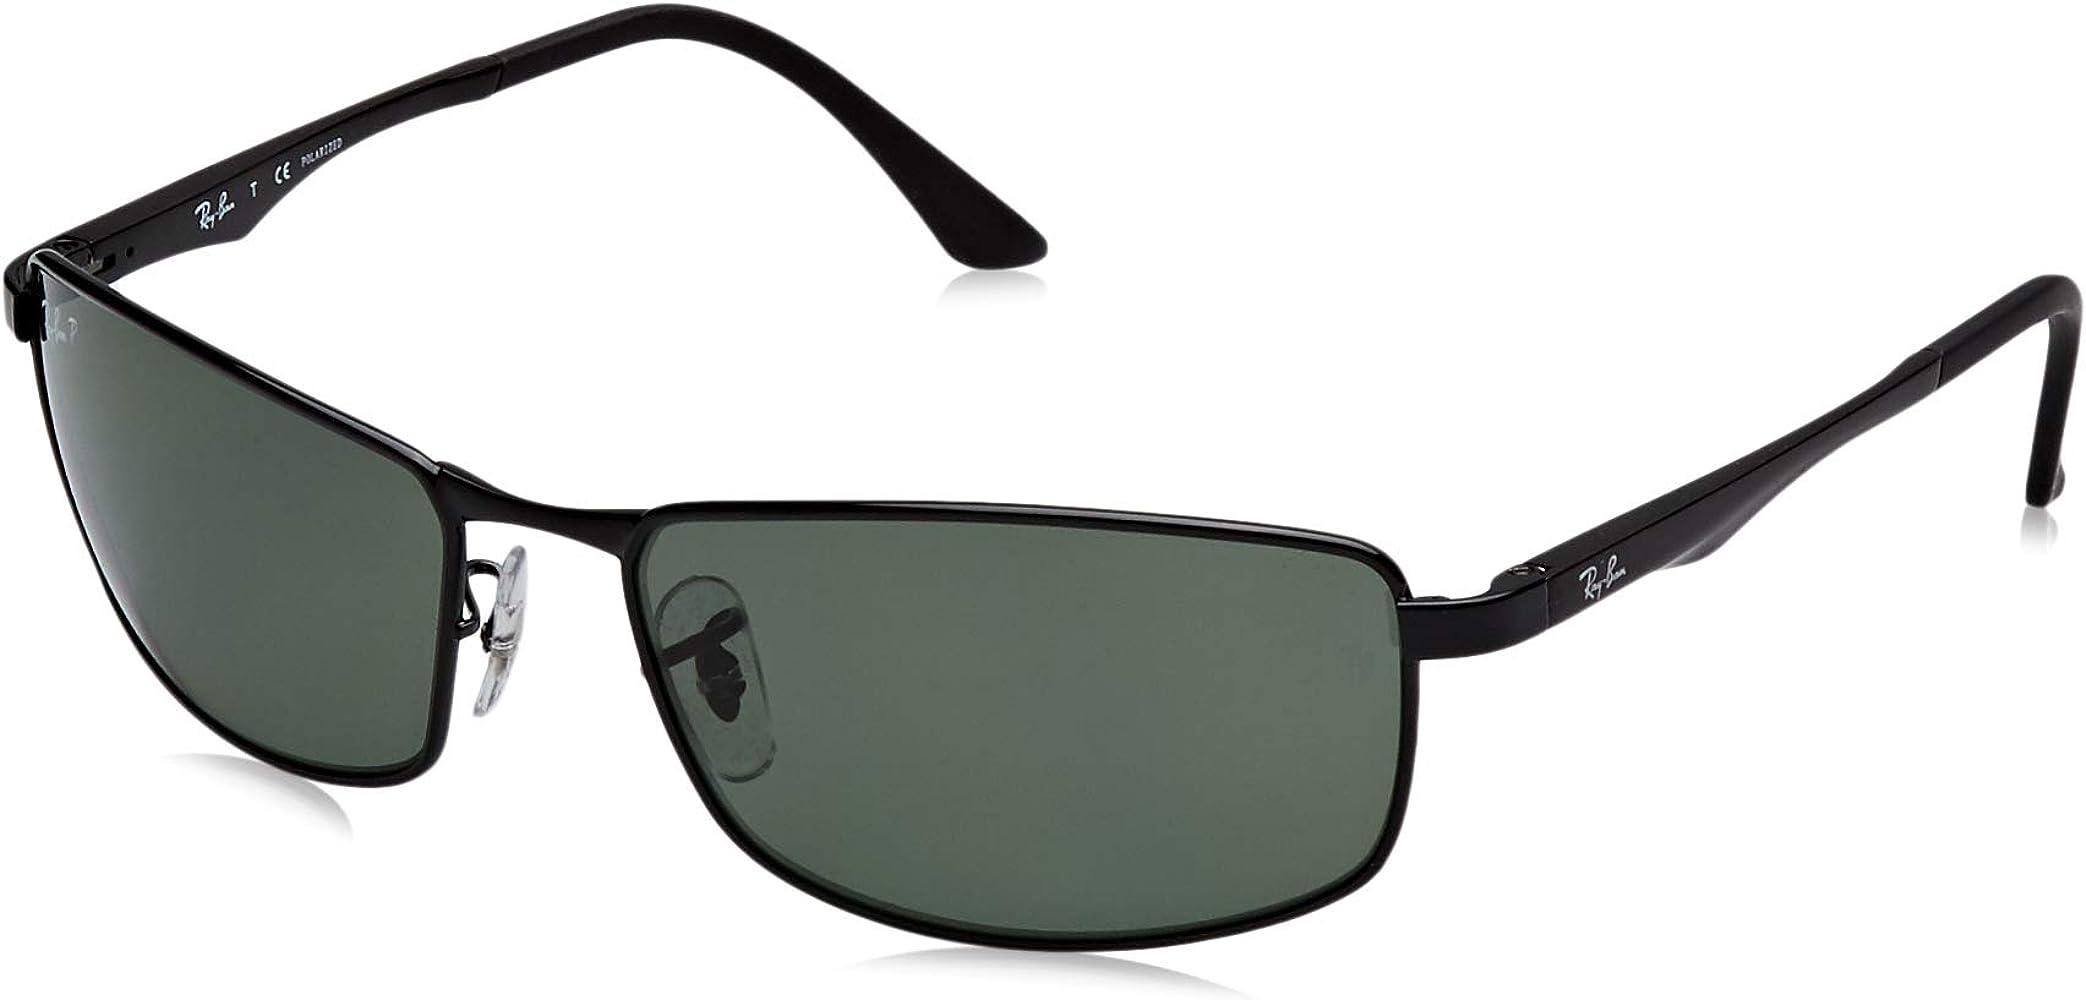 Ray-Ban Mod. 3498 Sole Gafas de Sol, 002/9A, 61 Unisex^Hombre ...